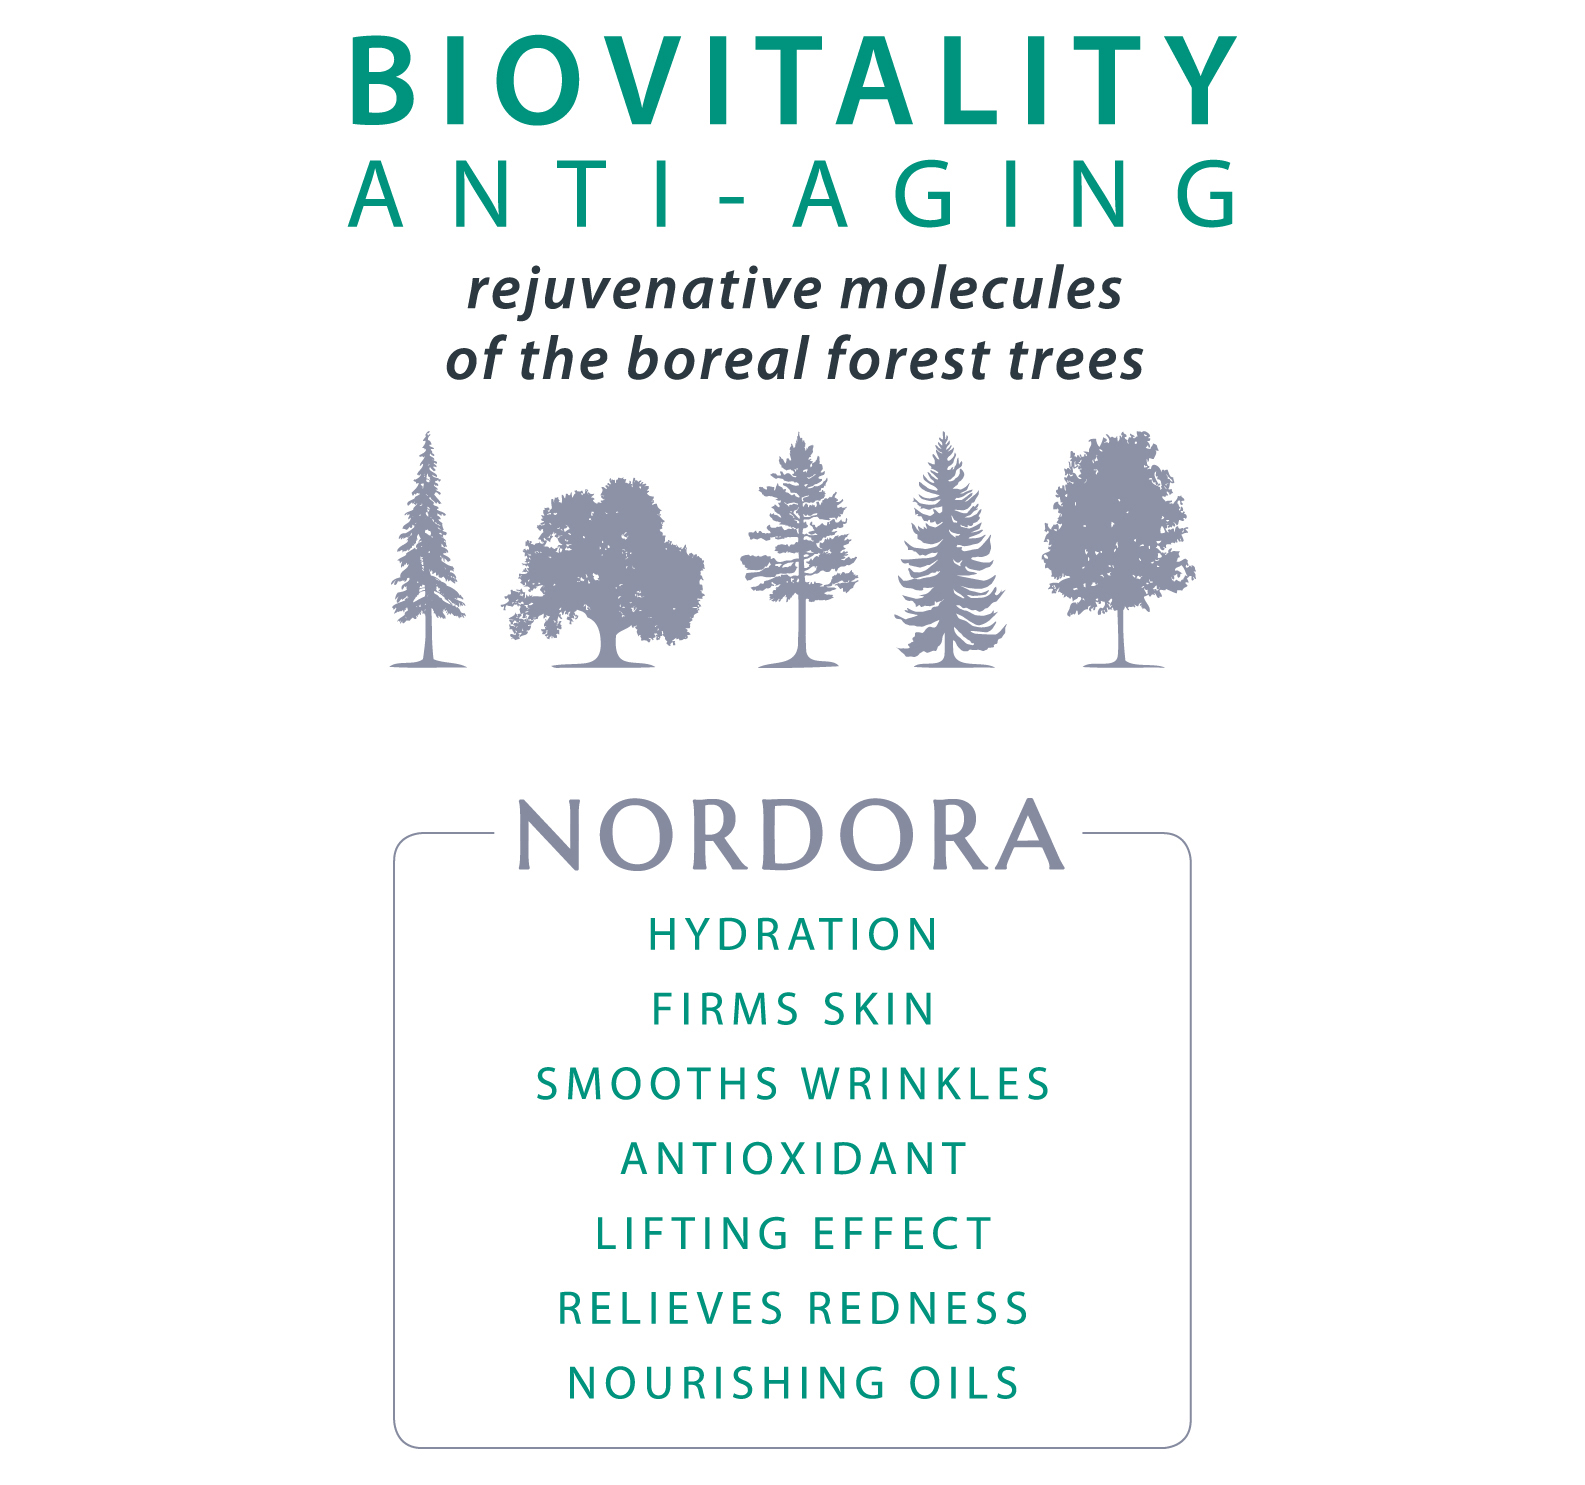 Nordora_BioVitality_Actions.jpg